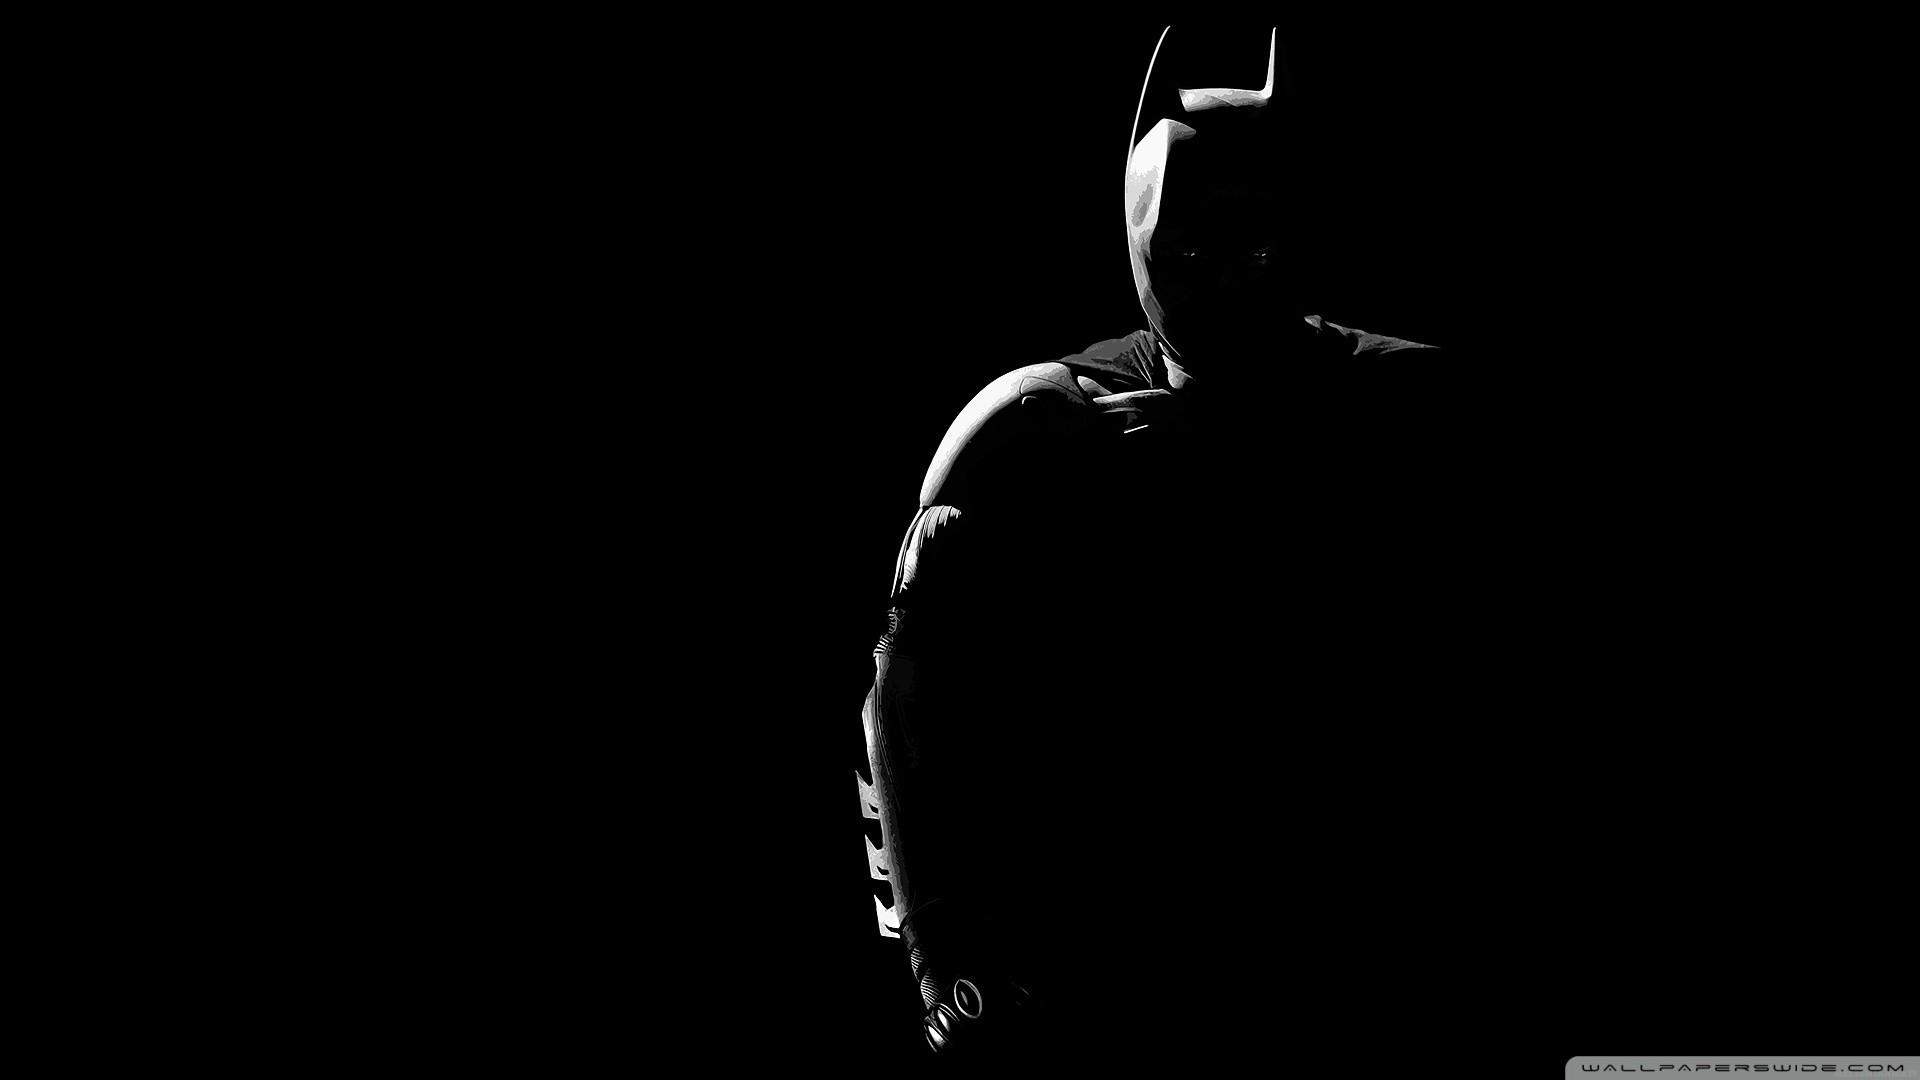 wallpapers de Batman The Dark Knight Rises · por Taboola por Taboola